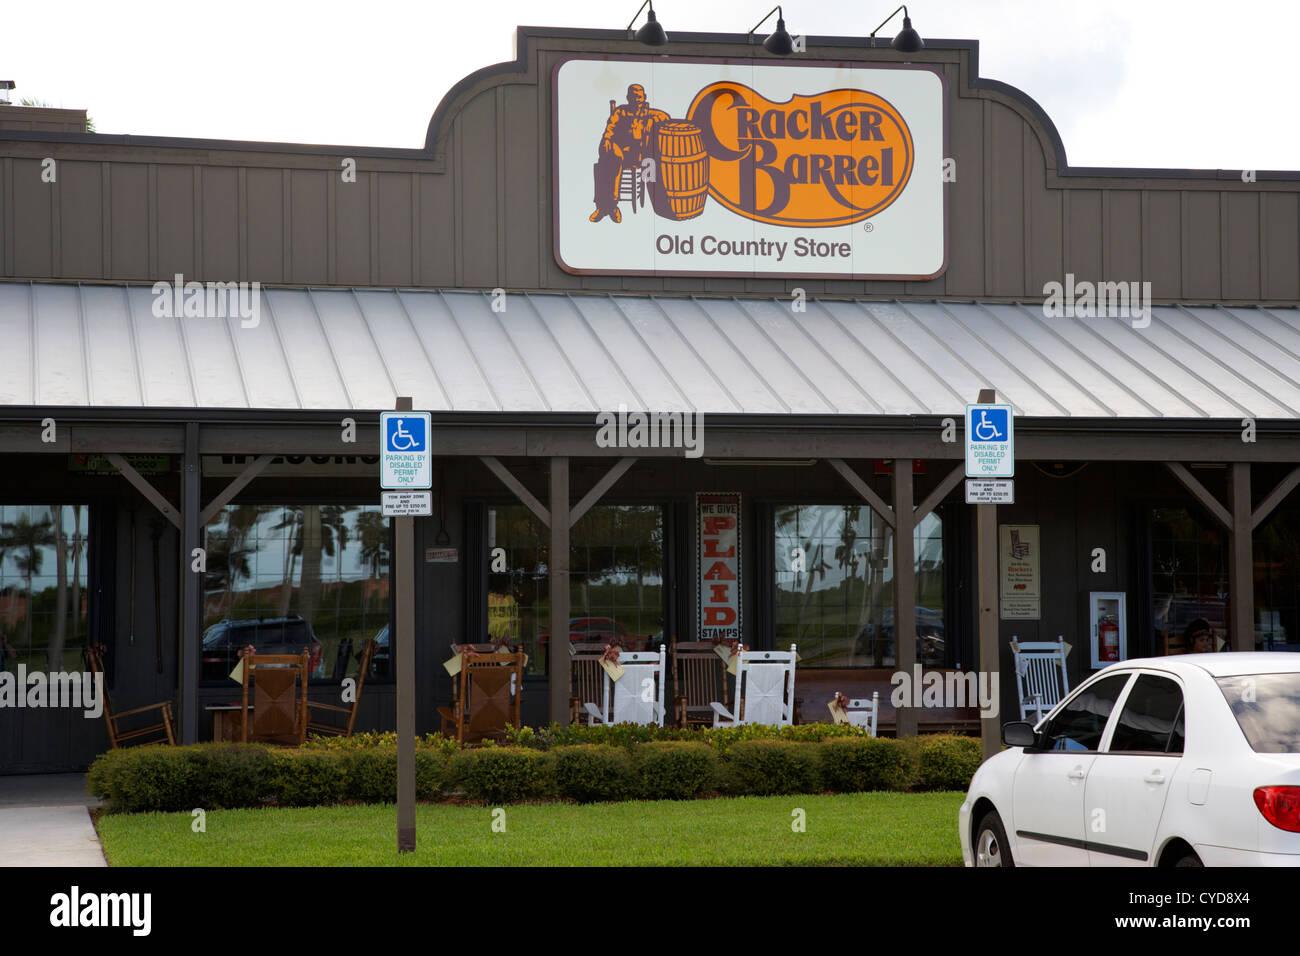 cracker barrel old country store restaurant homestead florida city usa - Stock Image